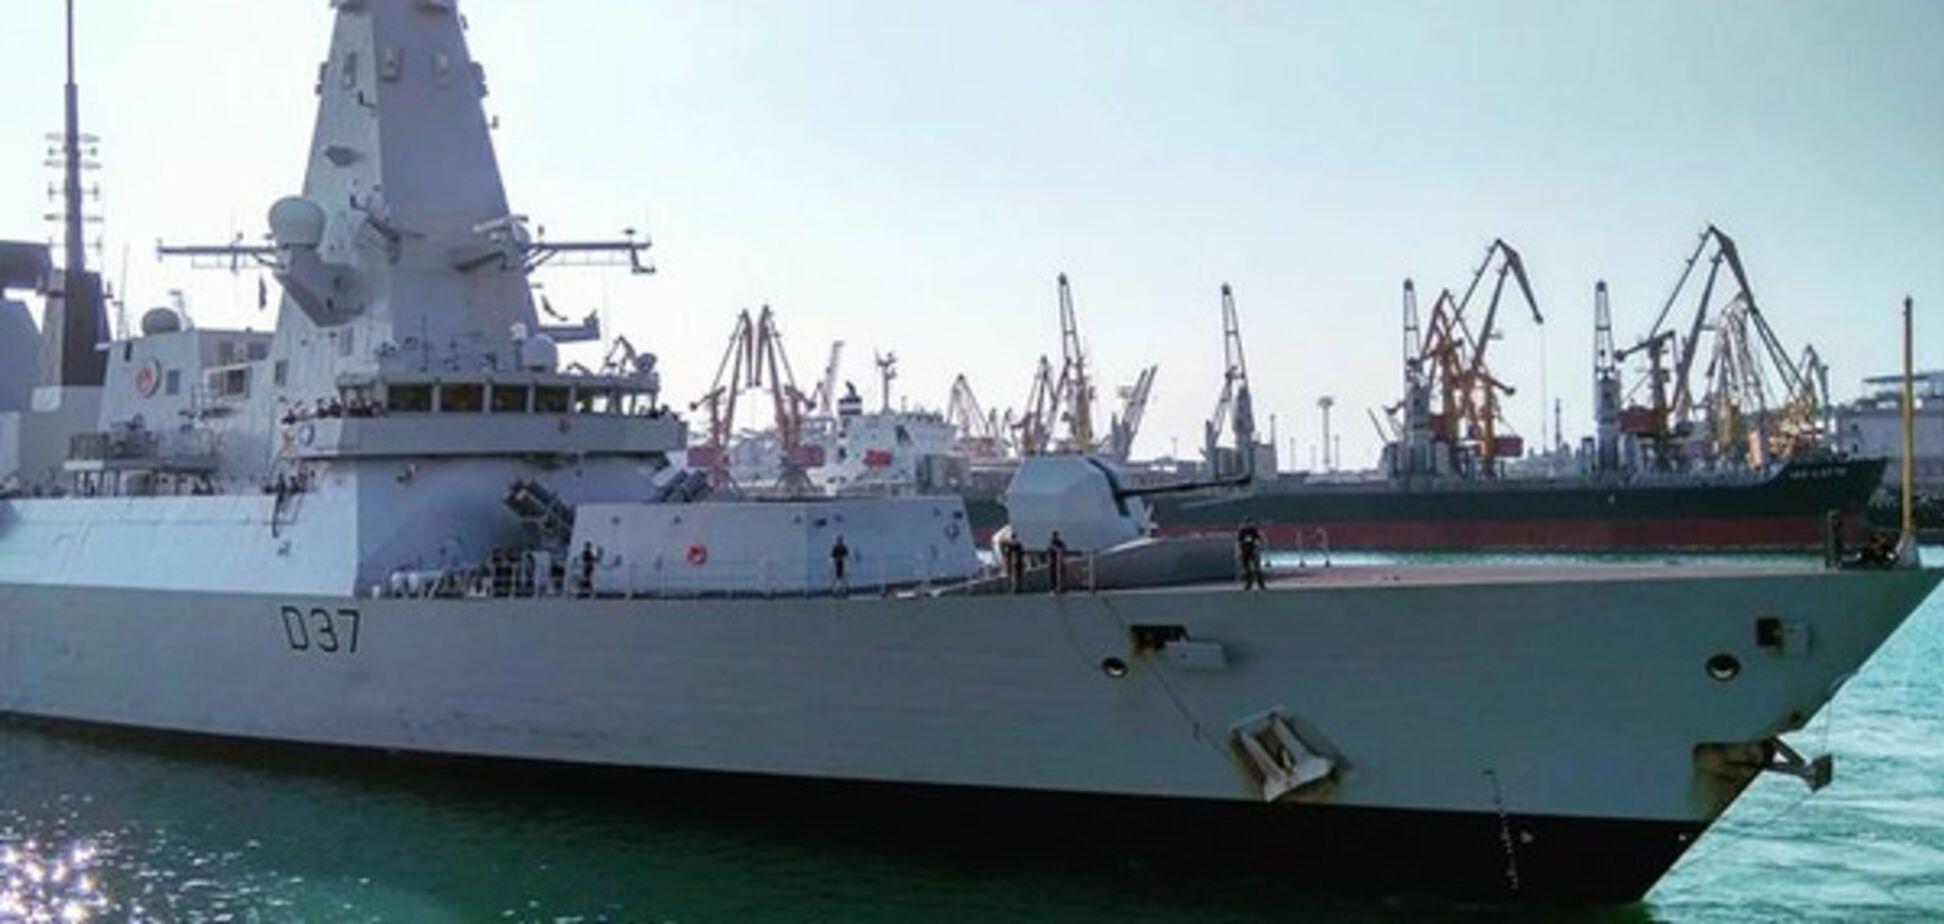 корабль НАТО D37 DUNCAN